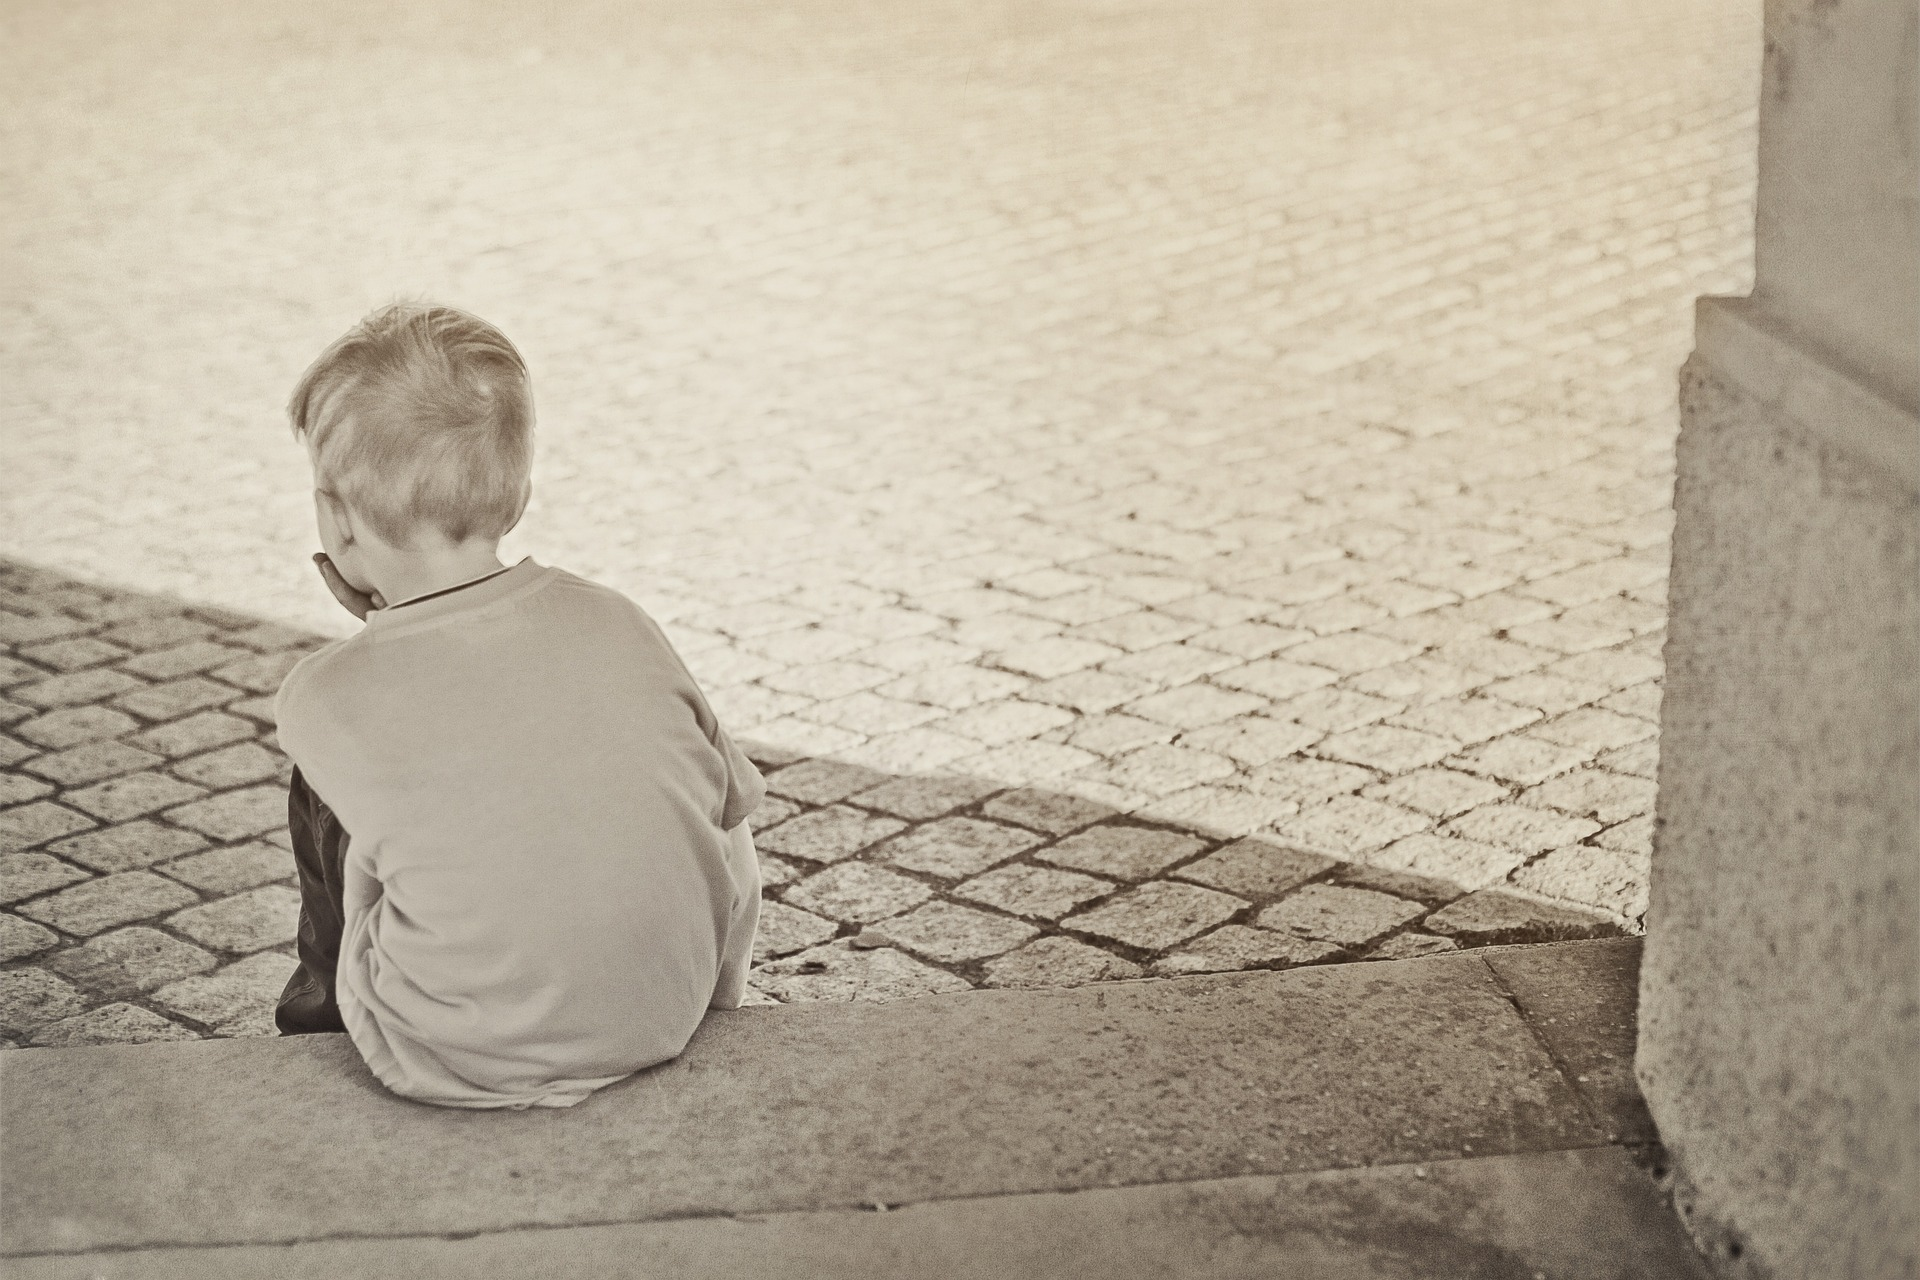 lonely-604086_1920.jpg